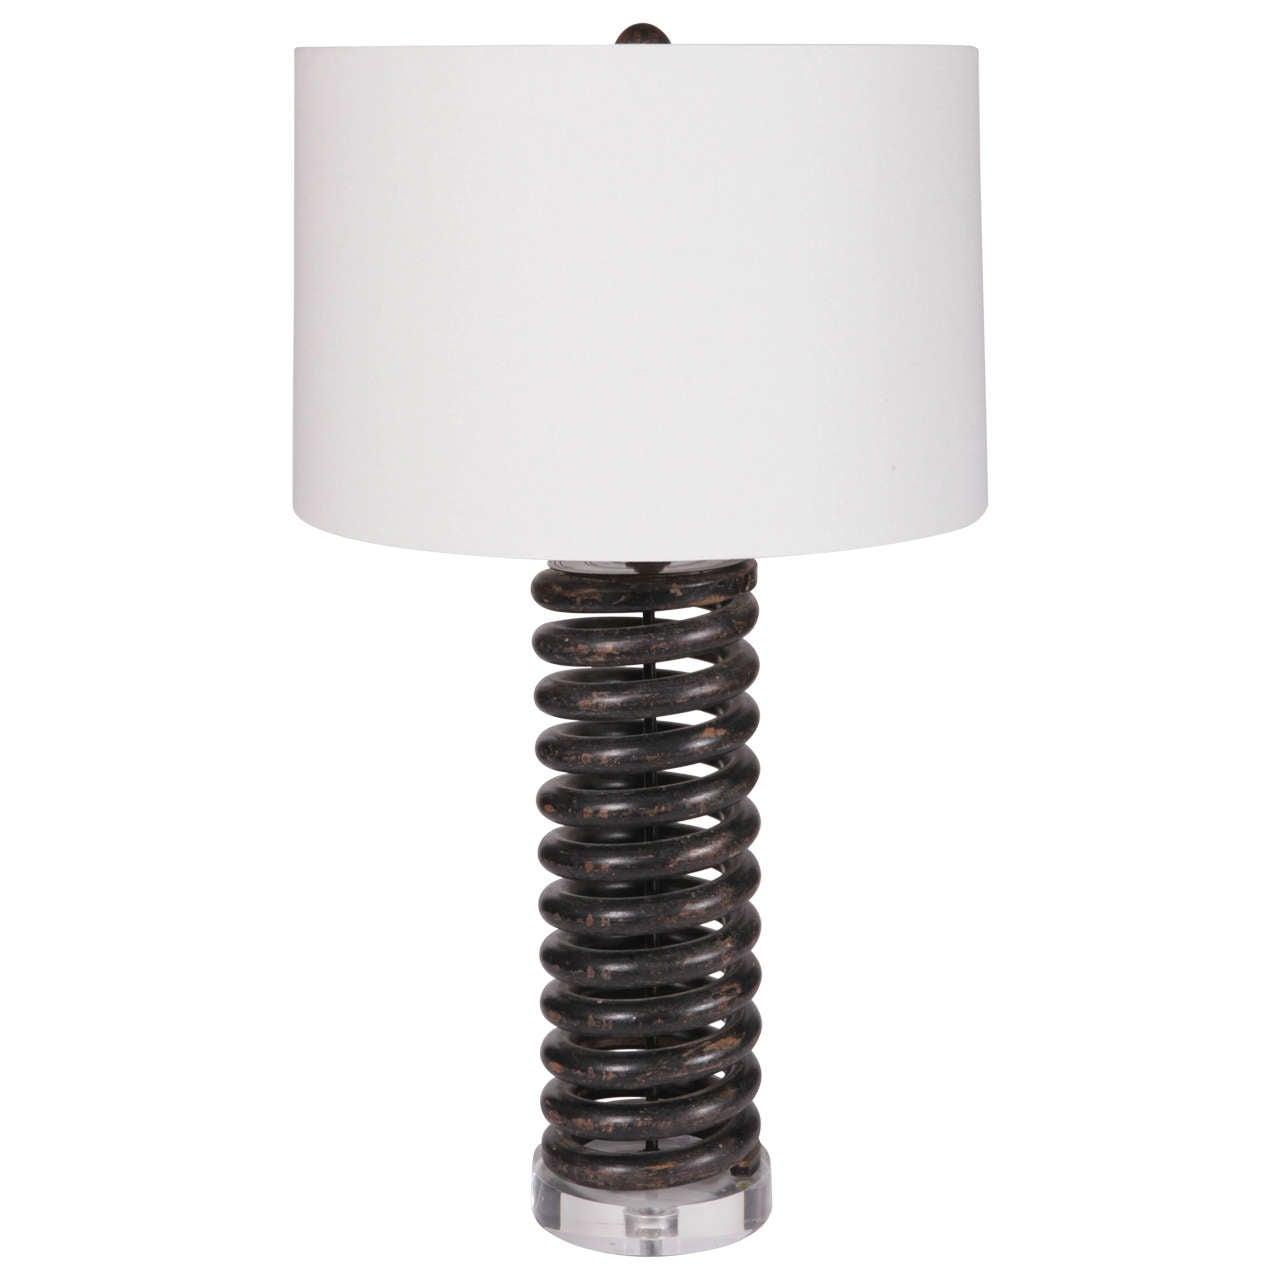 Vintage Industrial Coil Spring Lamp For Sale